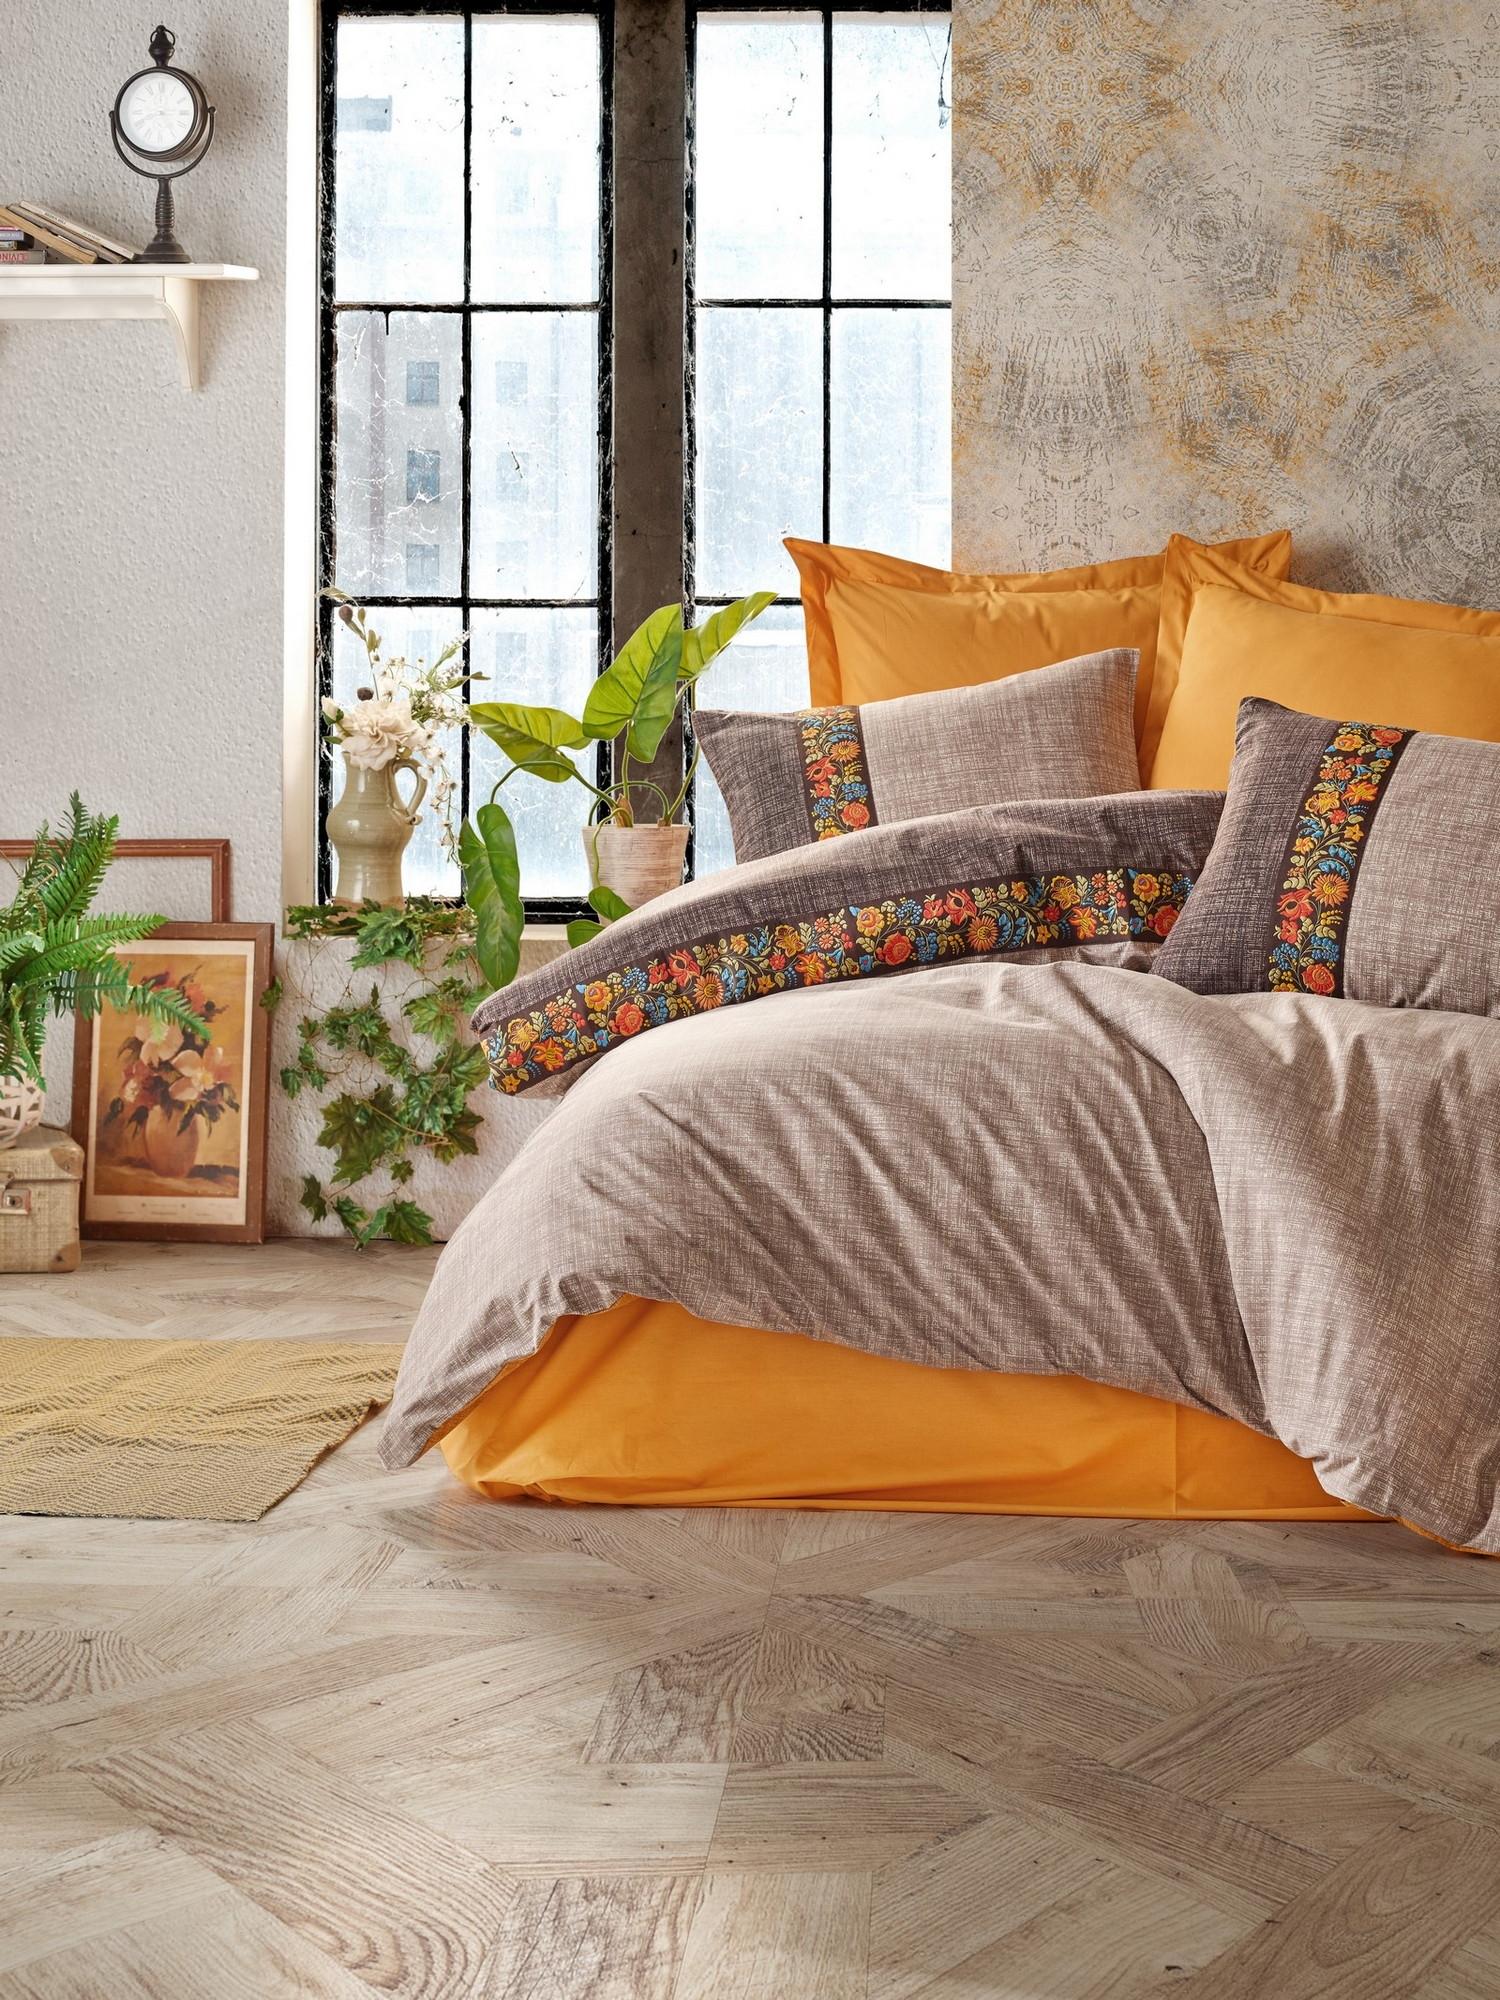 Lenjerie de pat din bumbac Ranforce, Folk Art Portocaliu / Maro , 200 x 220 cm